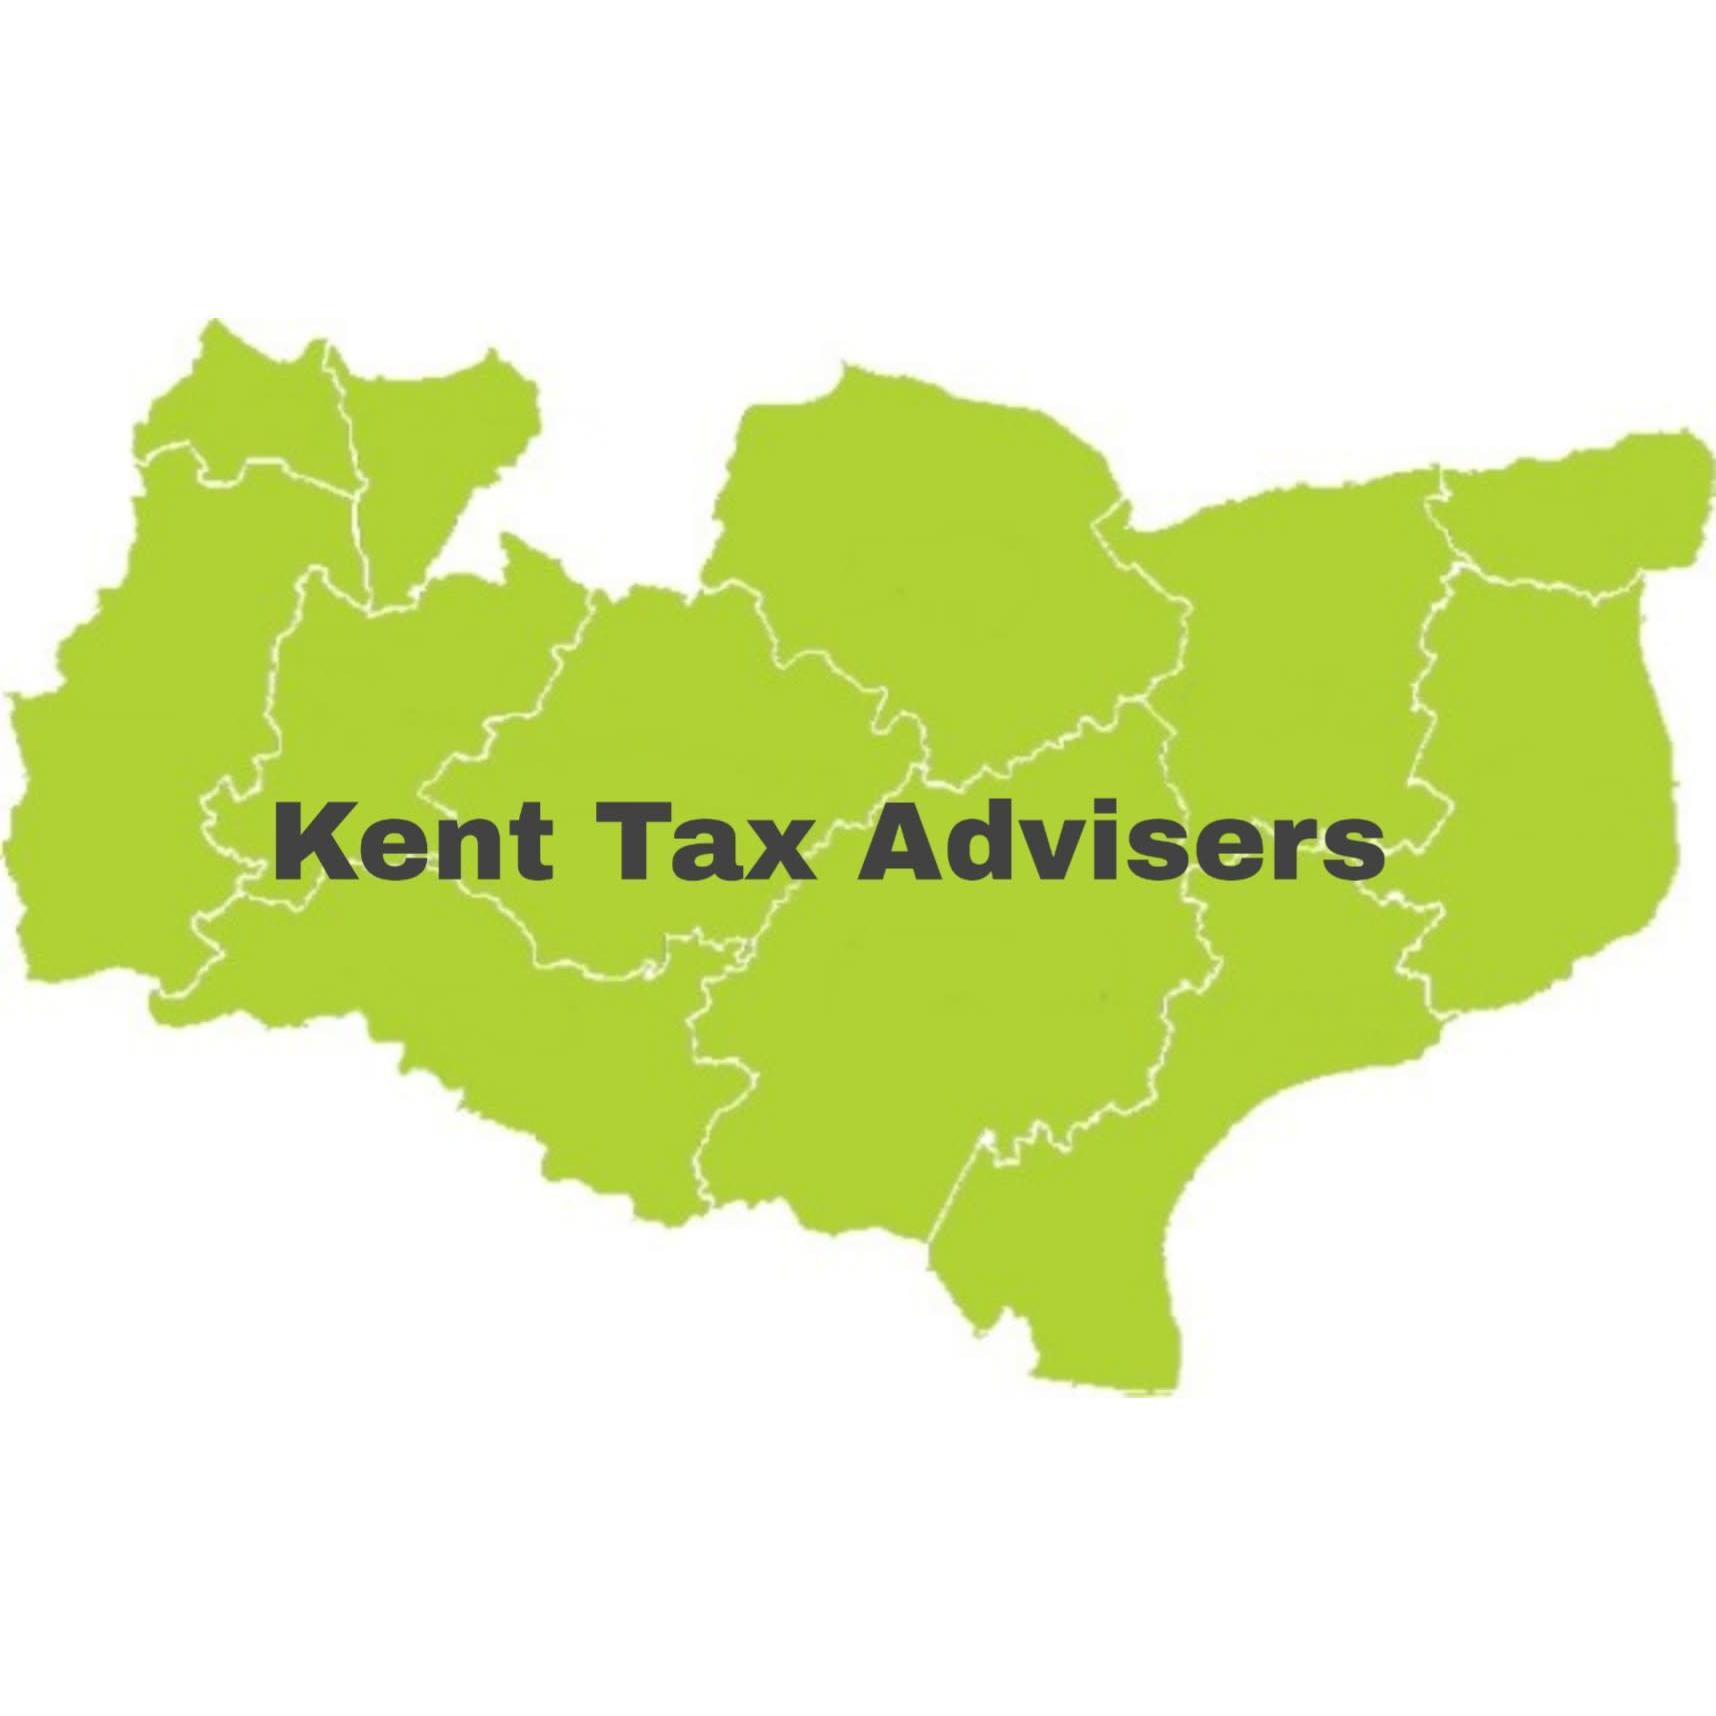 Kent Tax Advisers - Bexleyheath, London DA7 5EW - 020 8306 1399 | ShowMeLocal.com